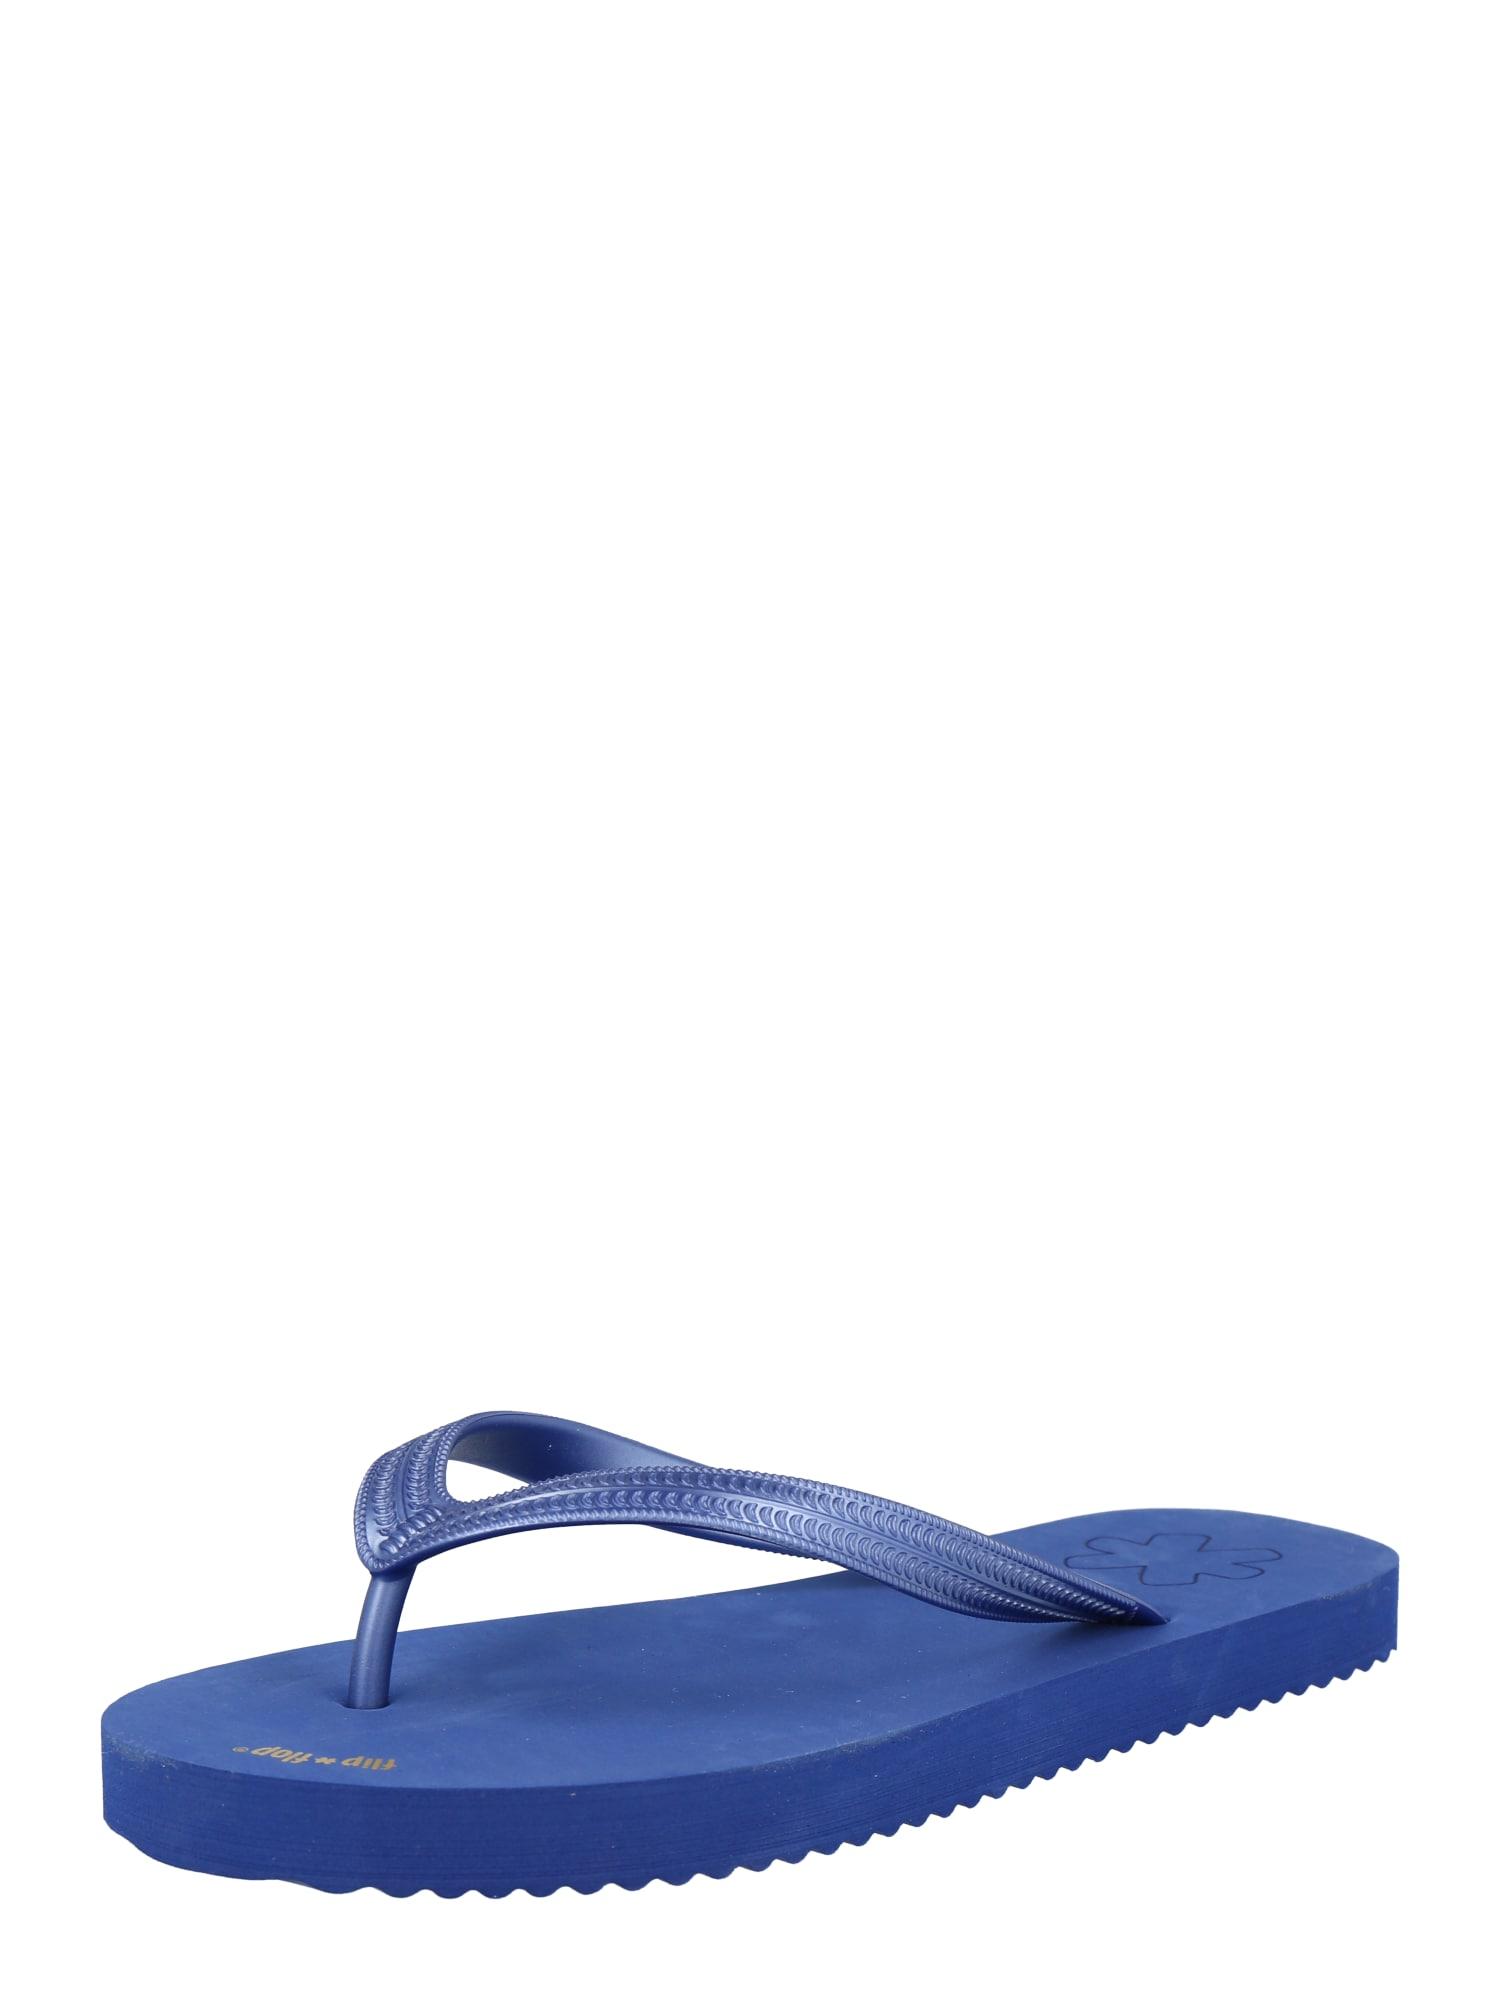 FLIP*FLOP Tongs  - Bleu - Taille: 41 - female